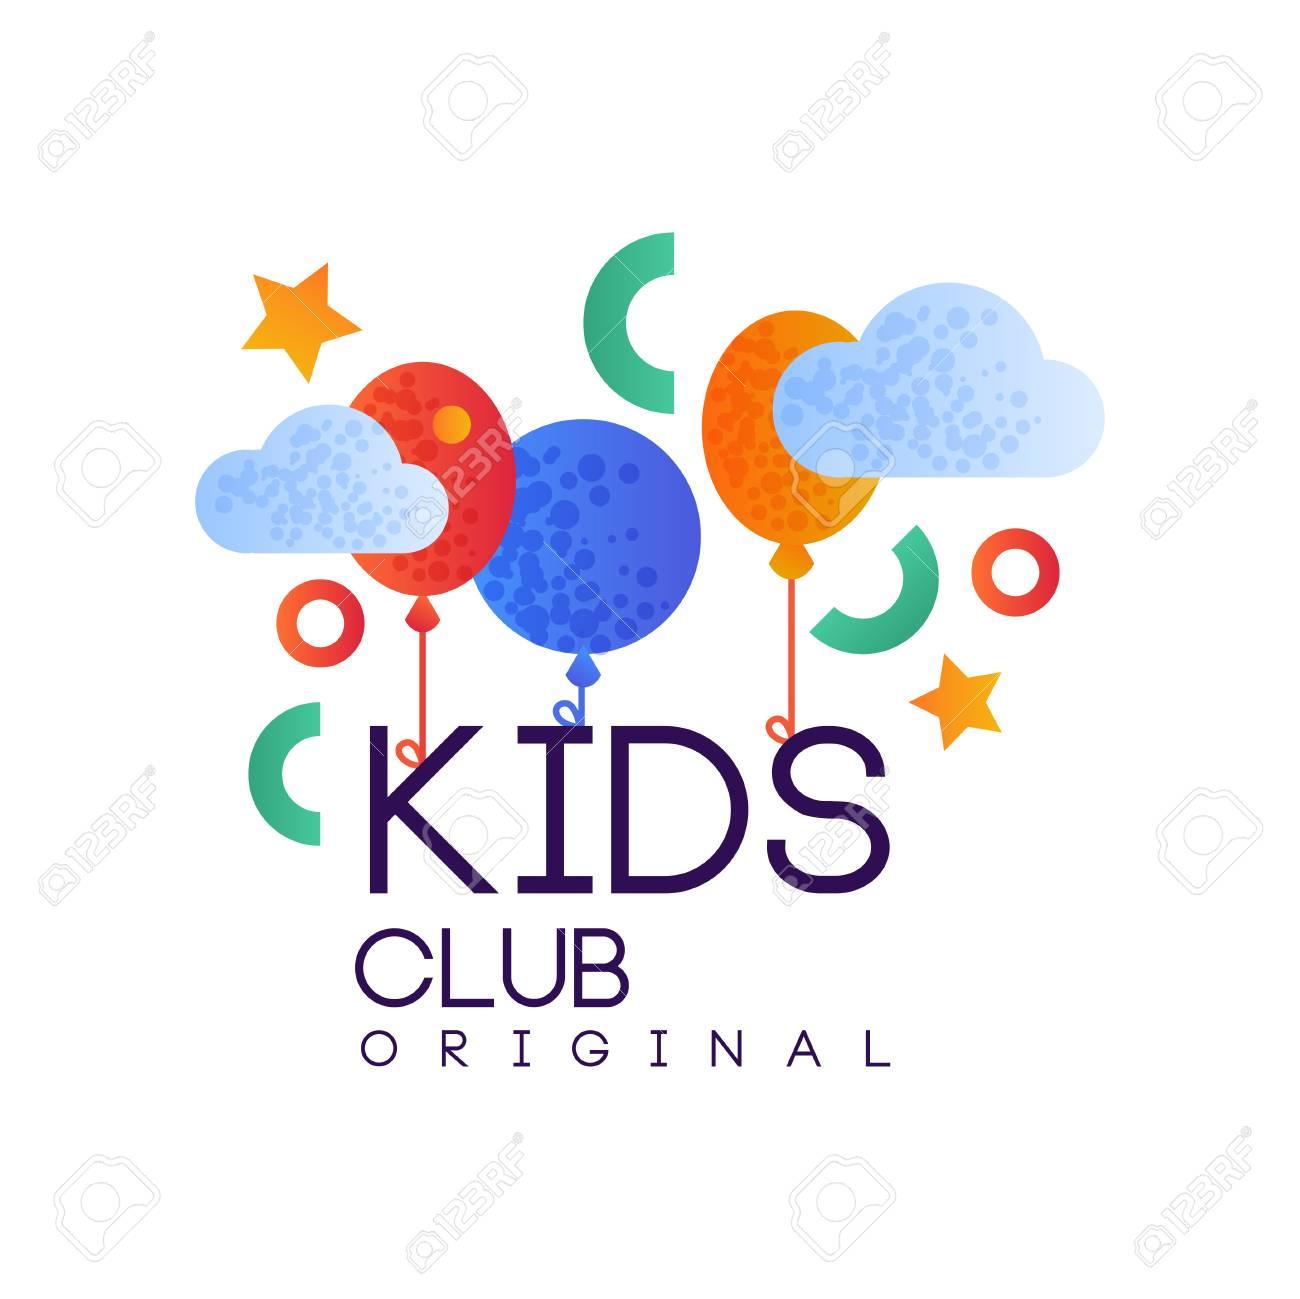 Kids Club Original Creative Label Template Playground